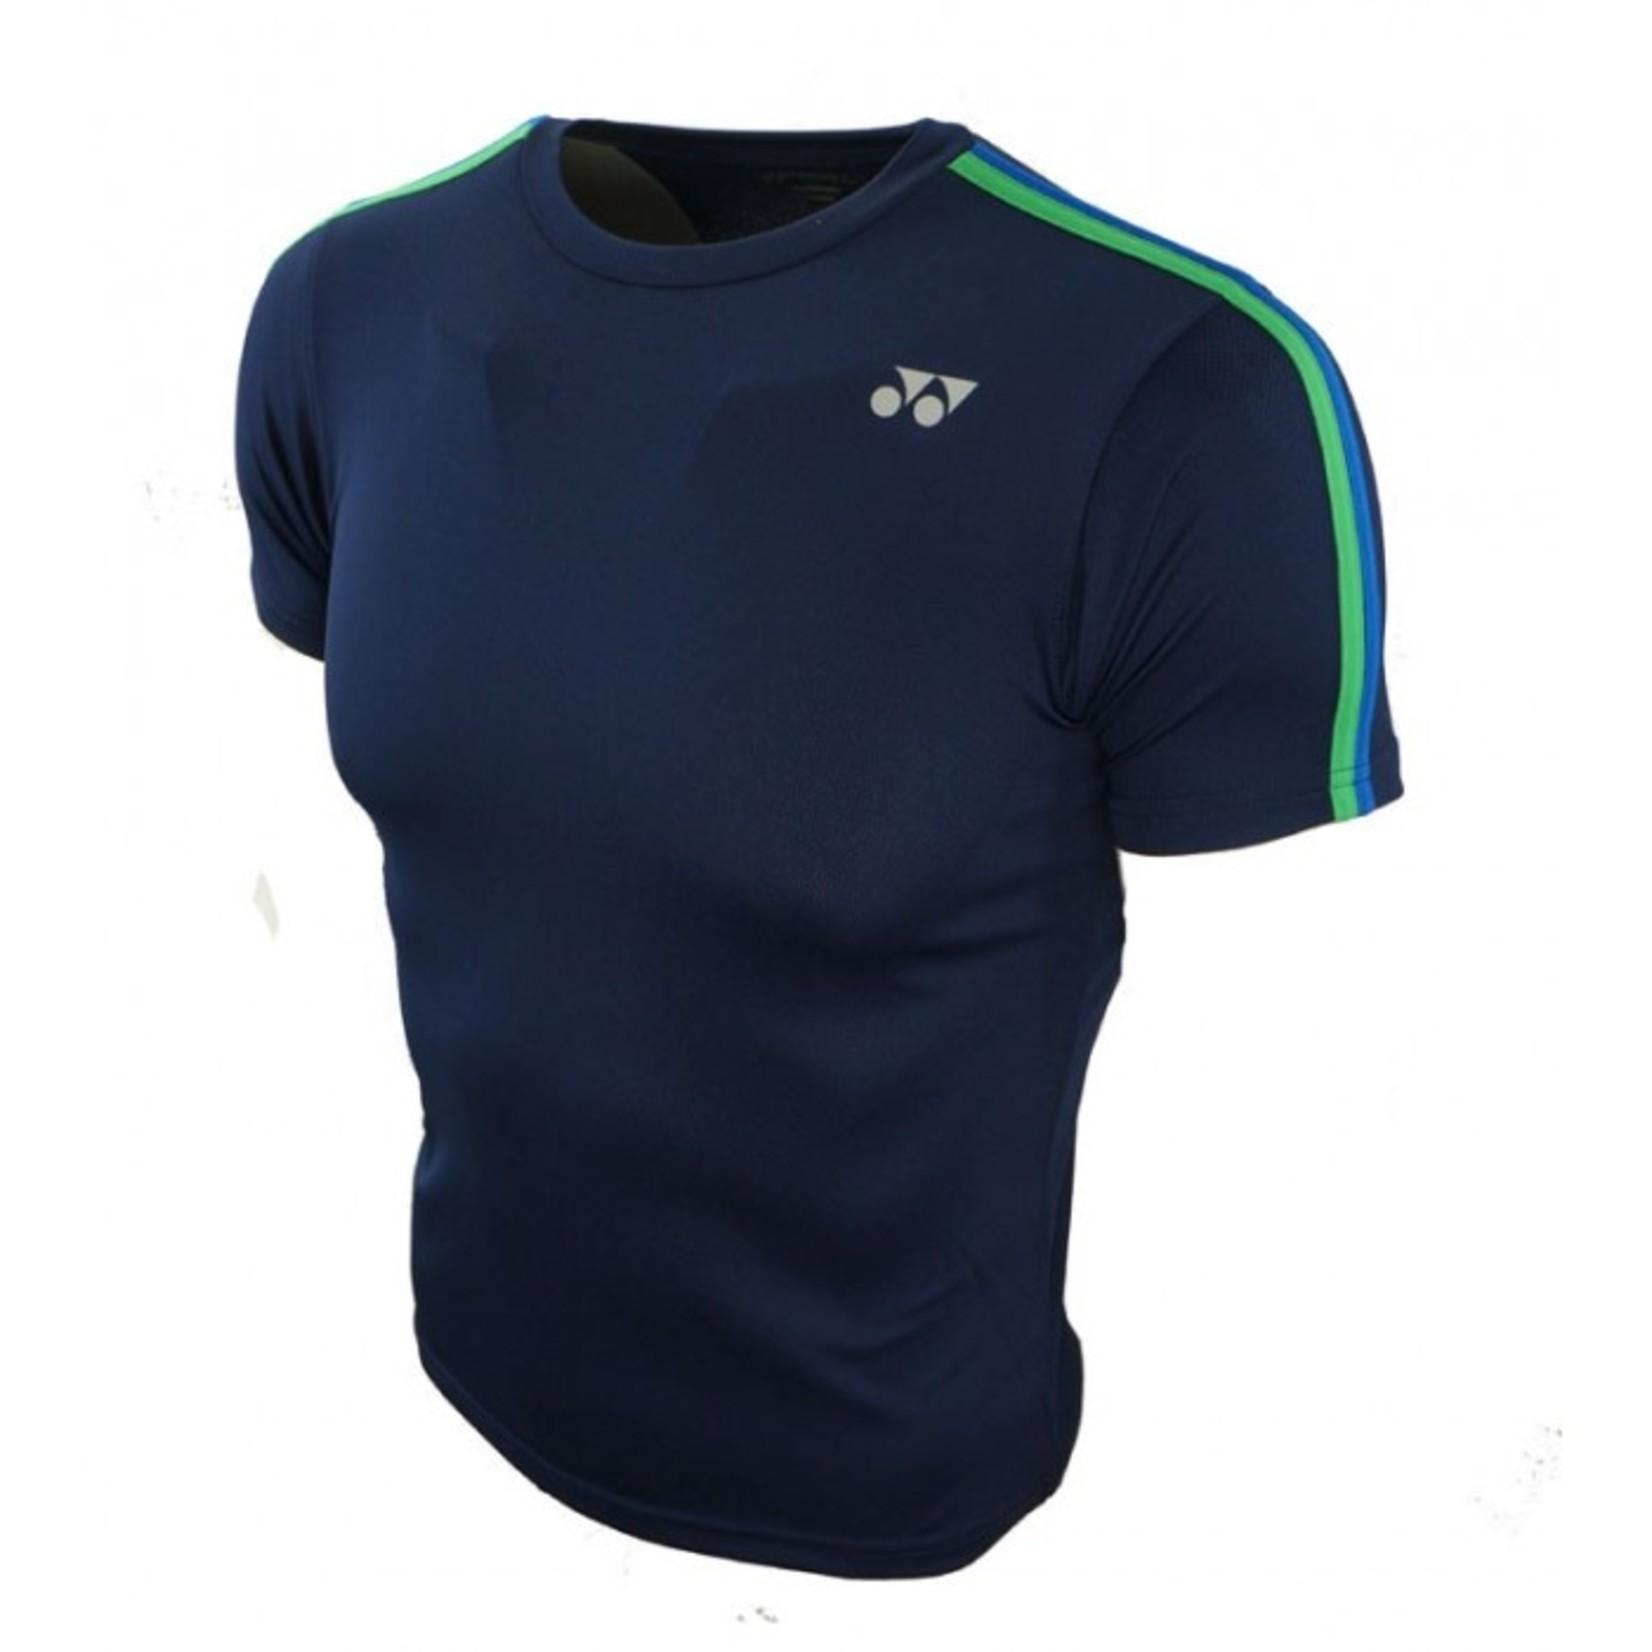 Yonex Yonex shirt YT1004EX